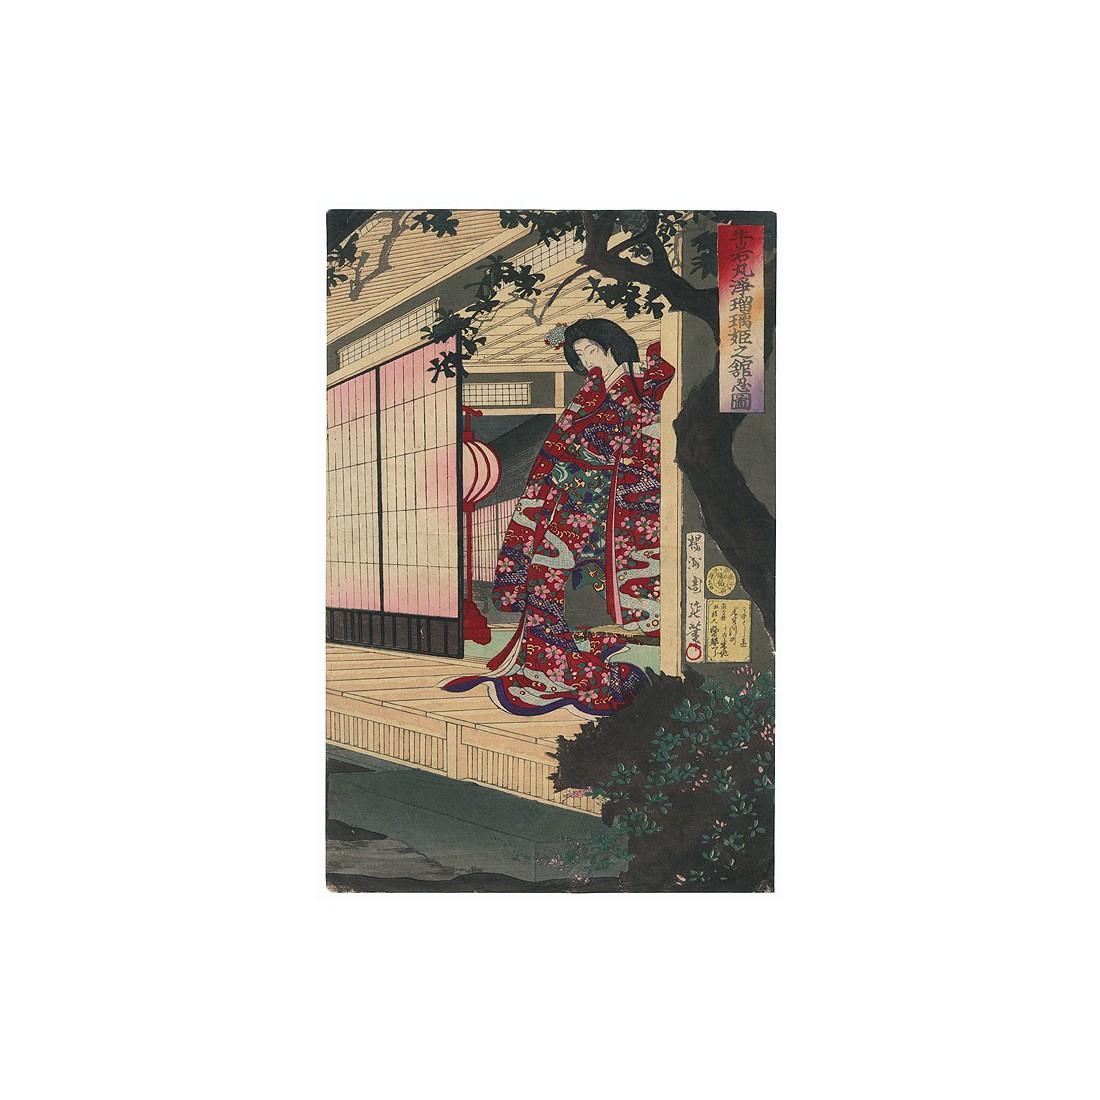 estampe japonaise Chikanobu Toyohara La princesse Joruri